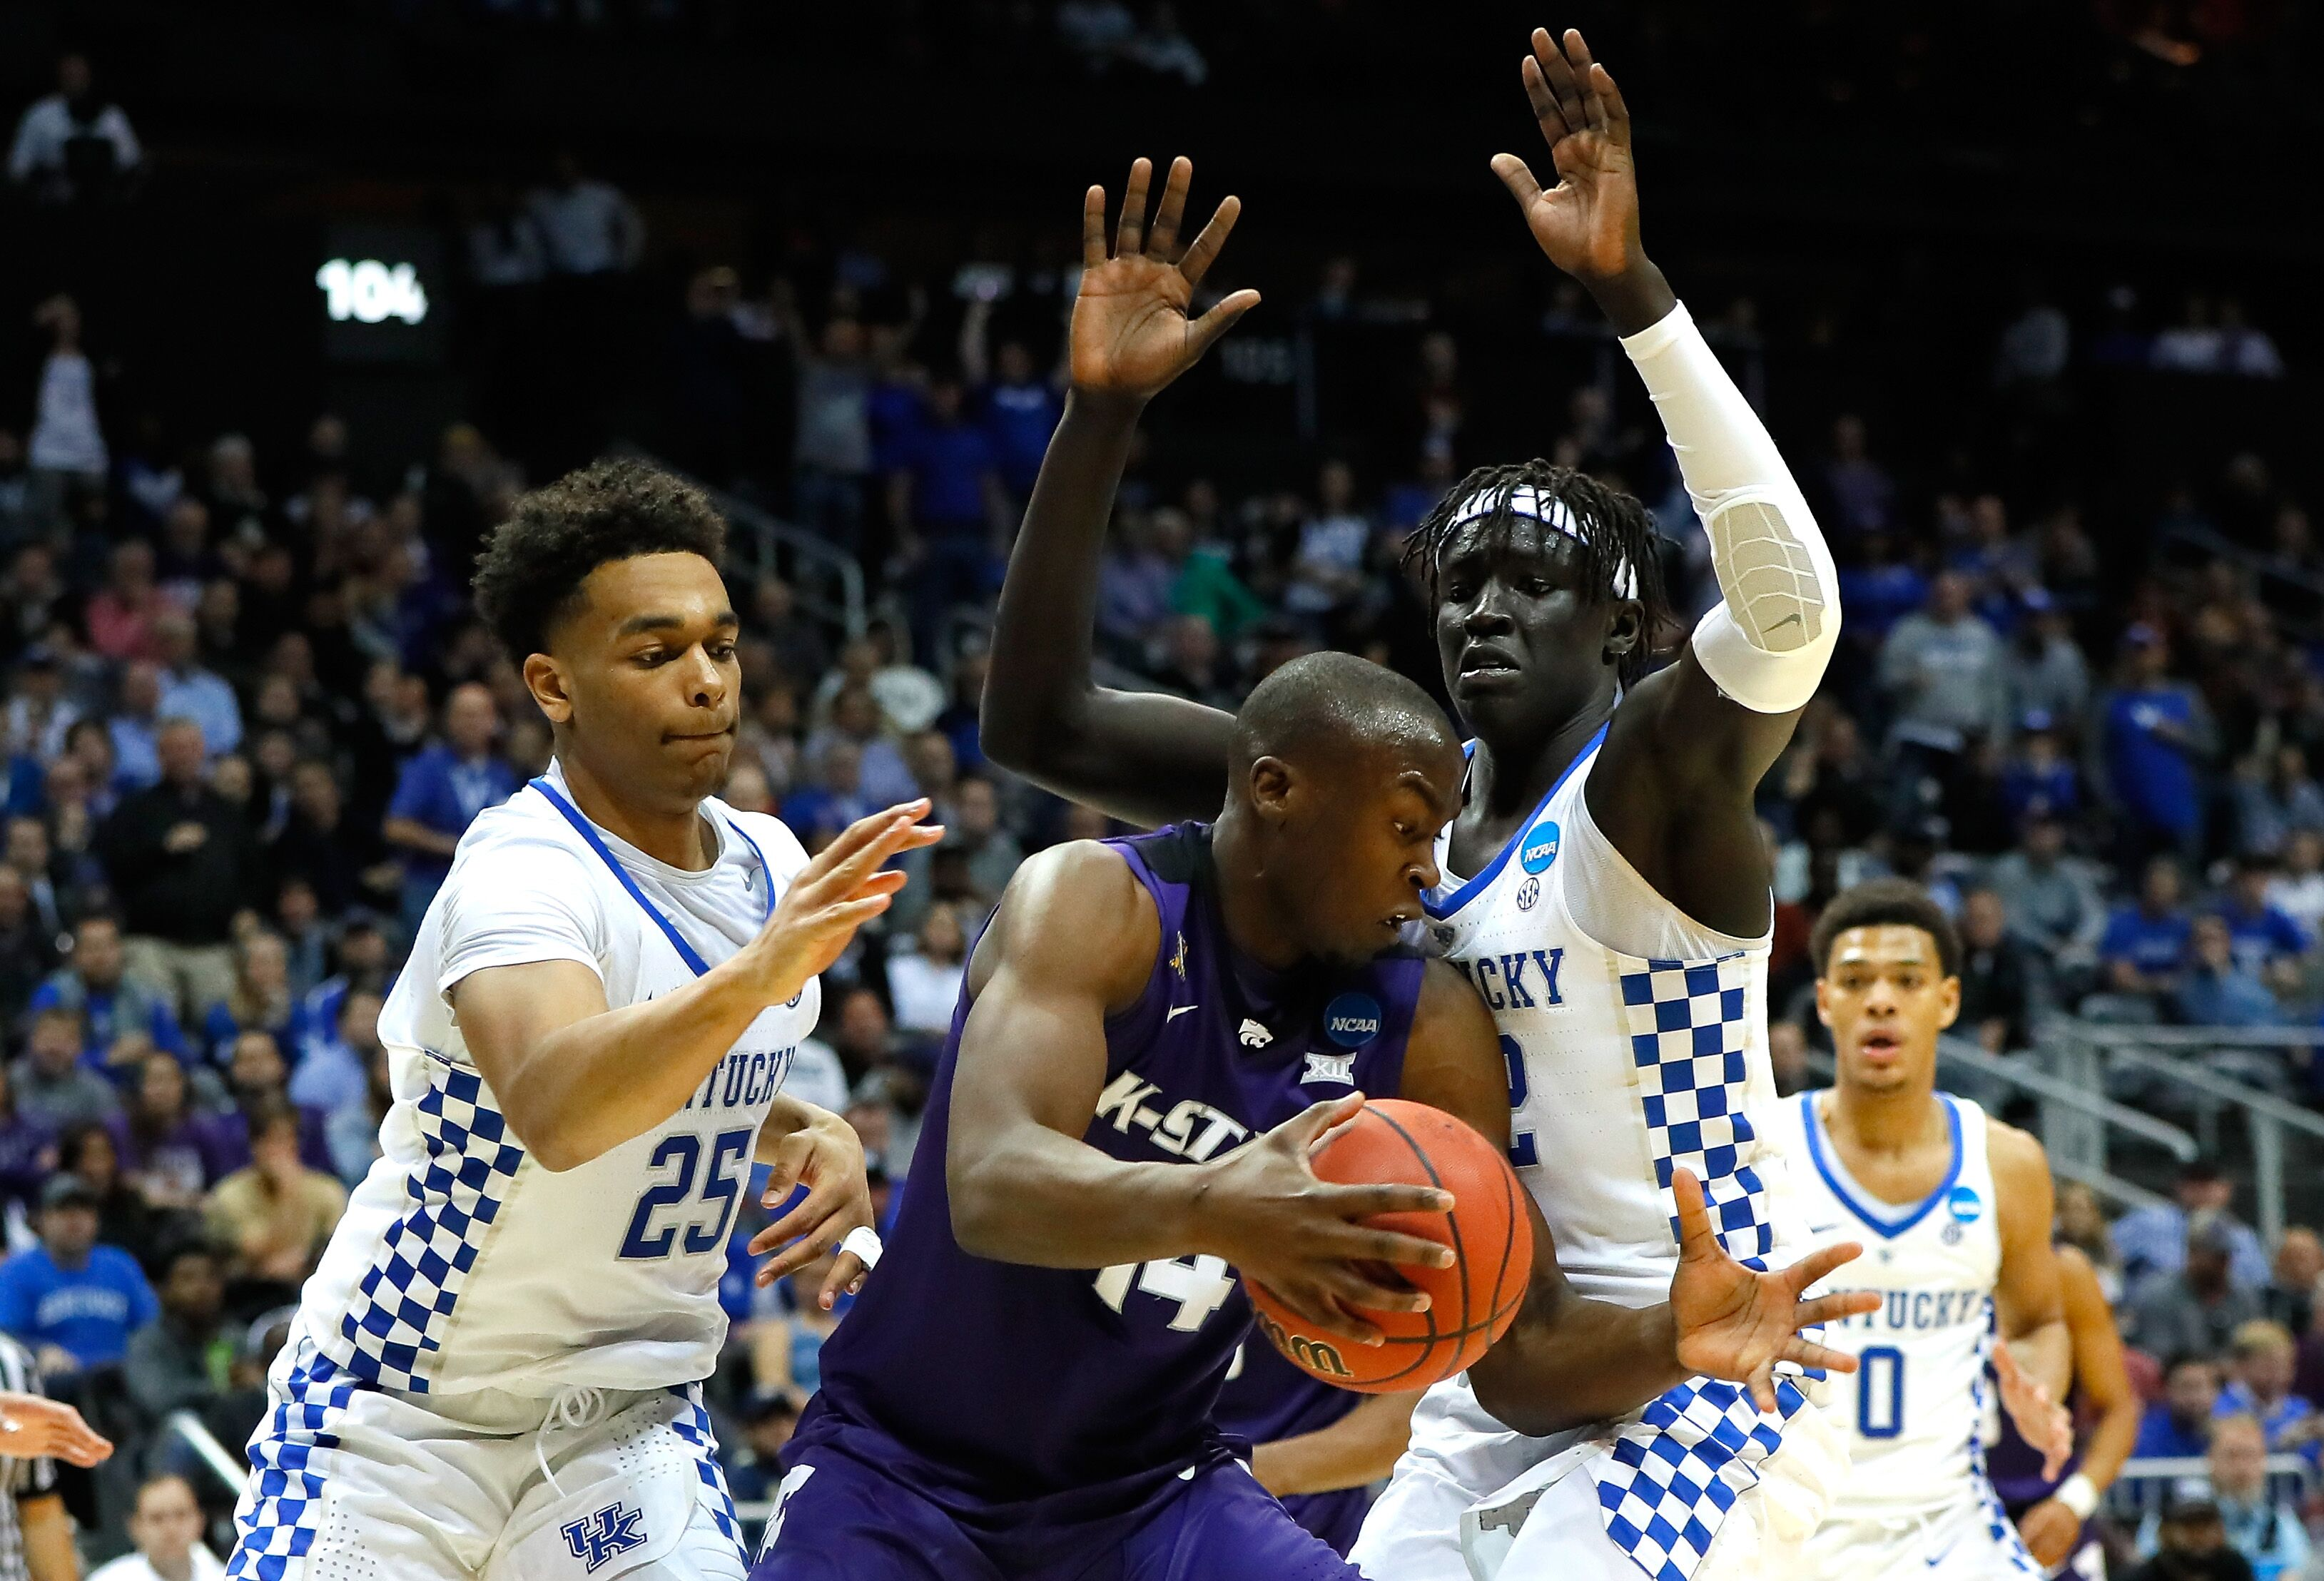 Kentucky Basketball Is Youngest Team For 2017 18 Data: Kentucky Basketball: Final Observations From 2017-18 (Part 2